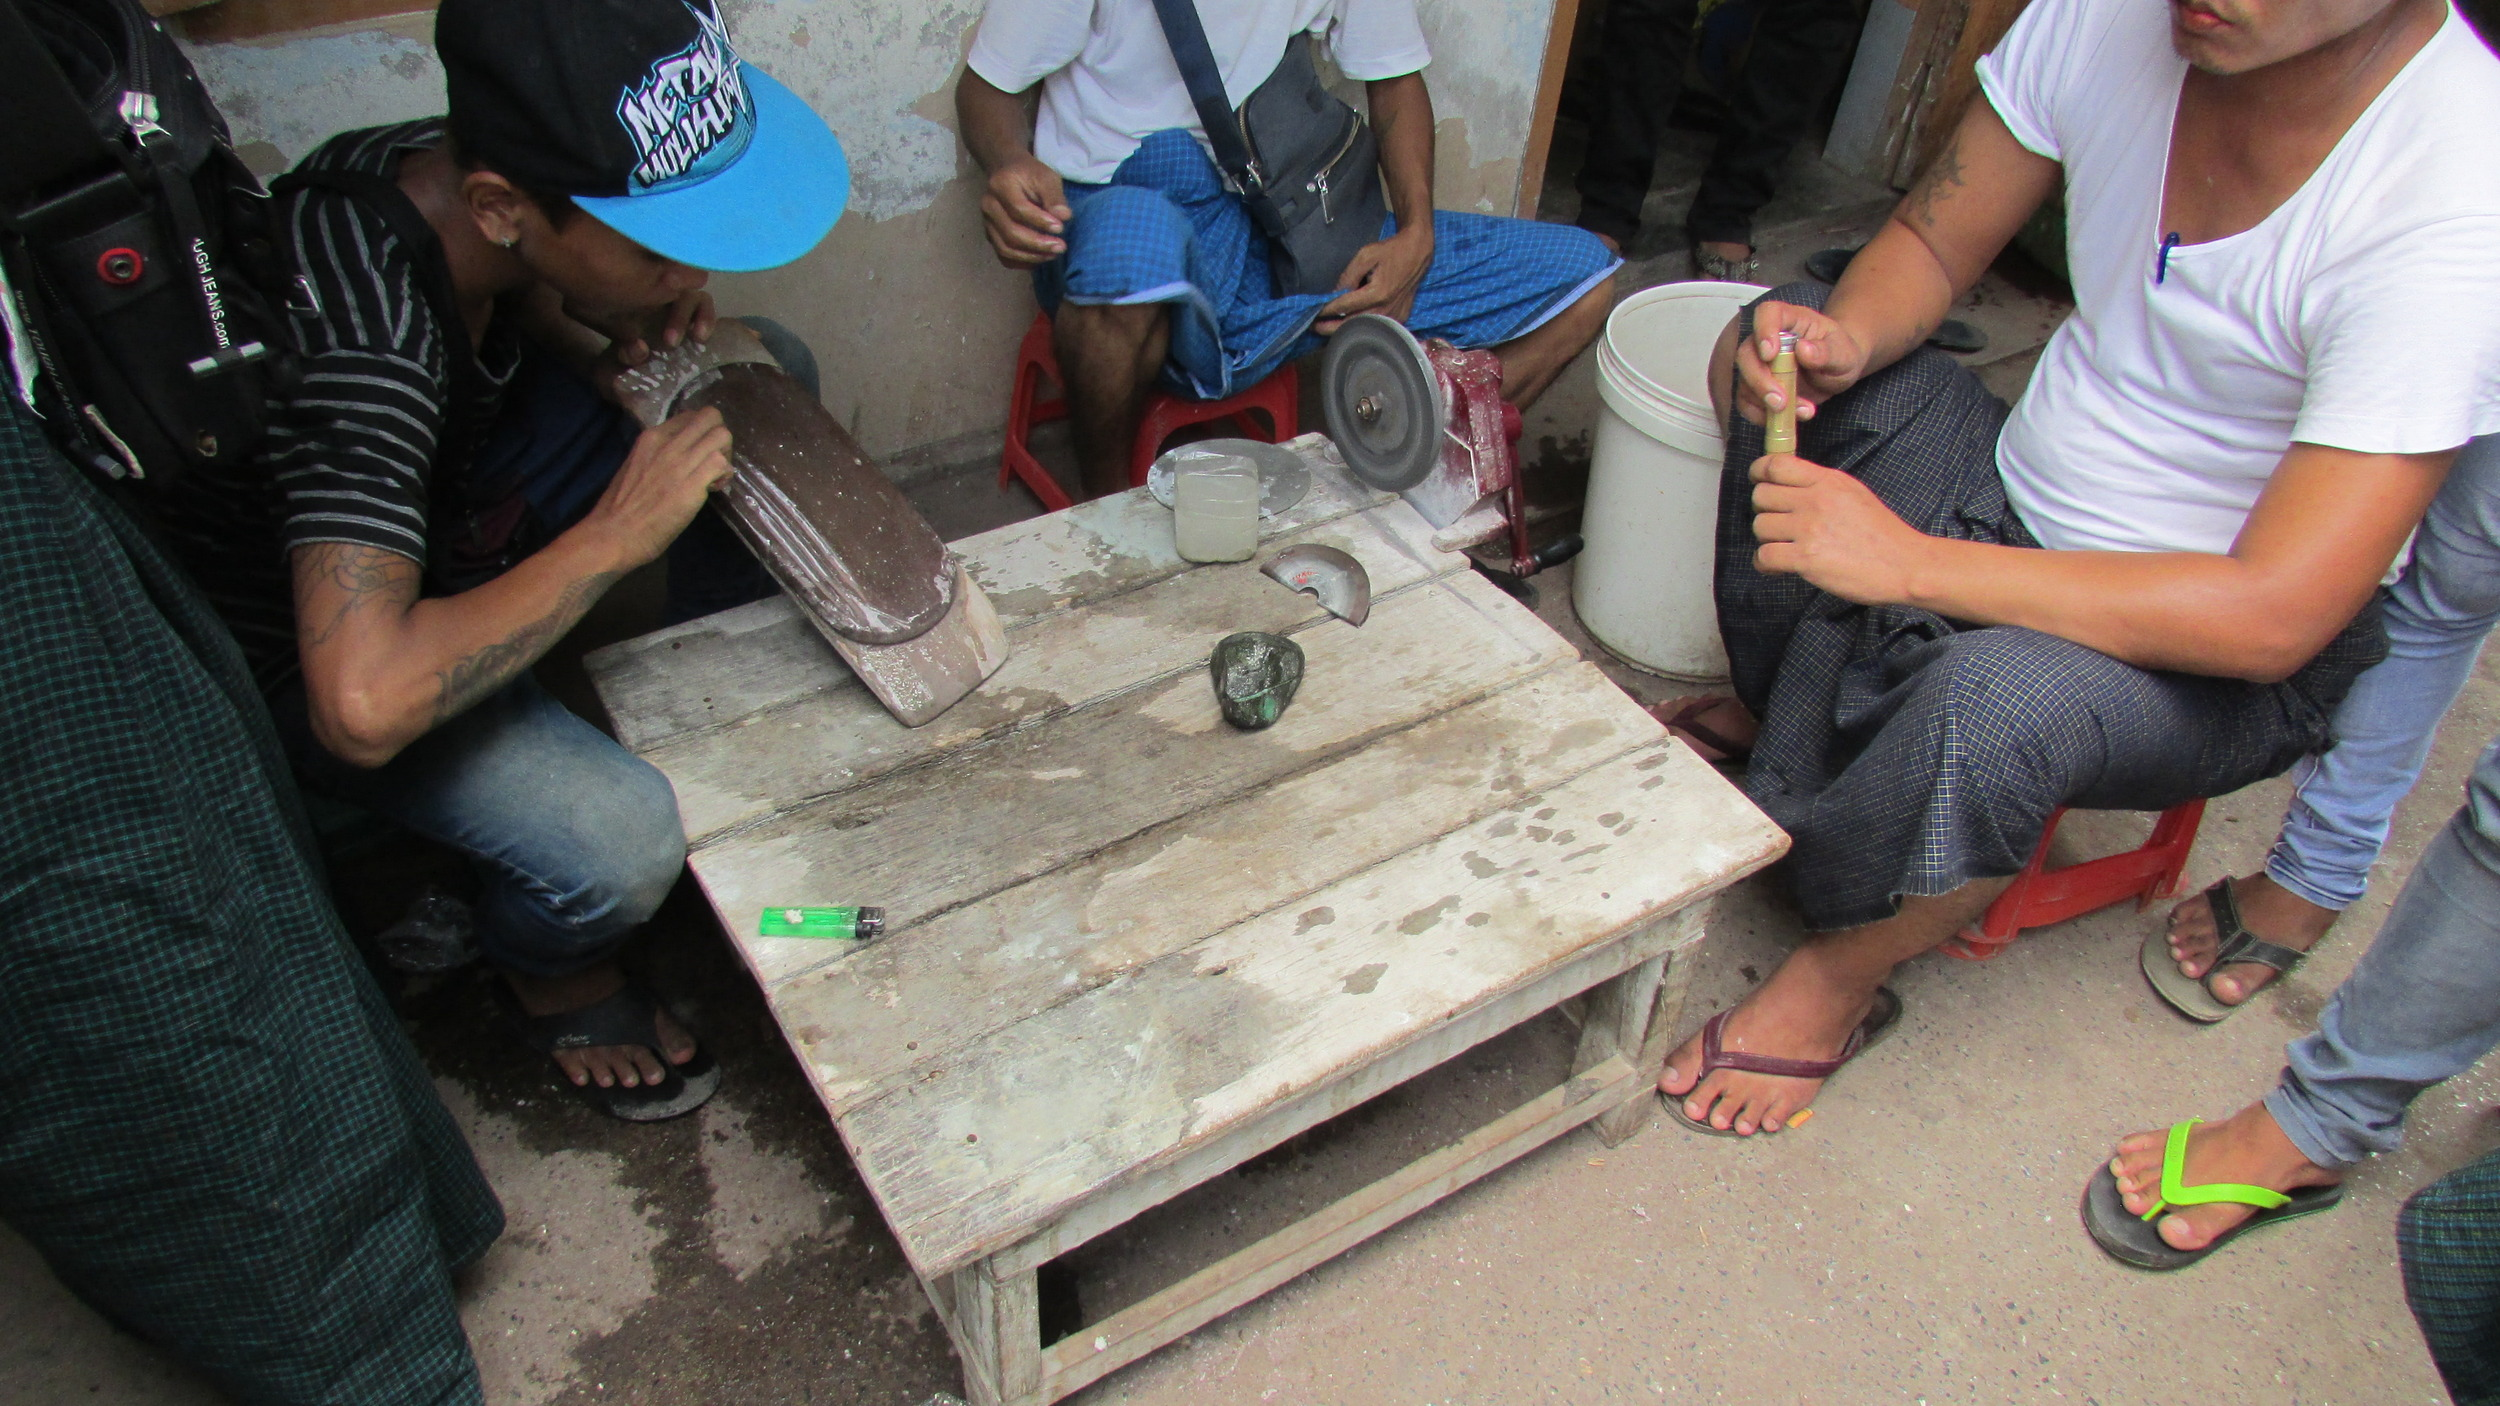 Men's feet at the jade market in Mandalay.